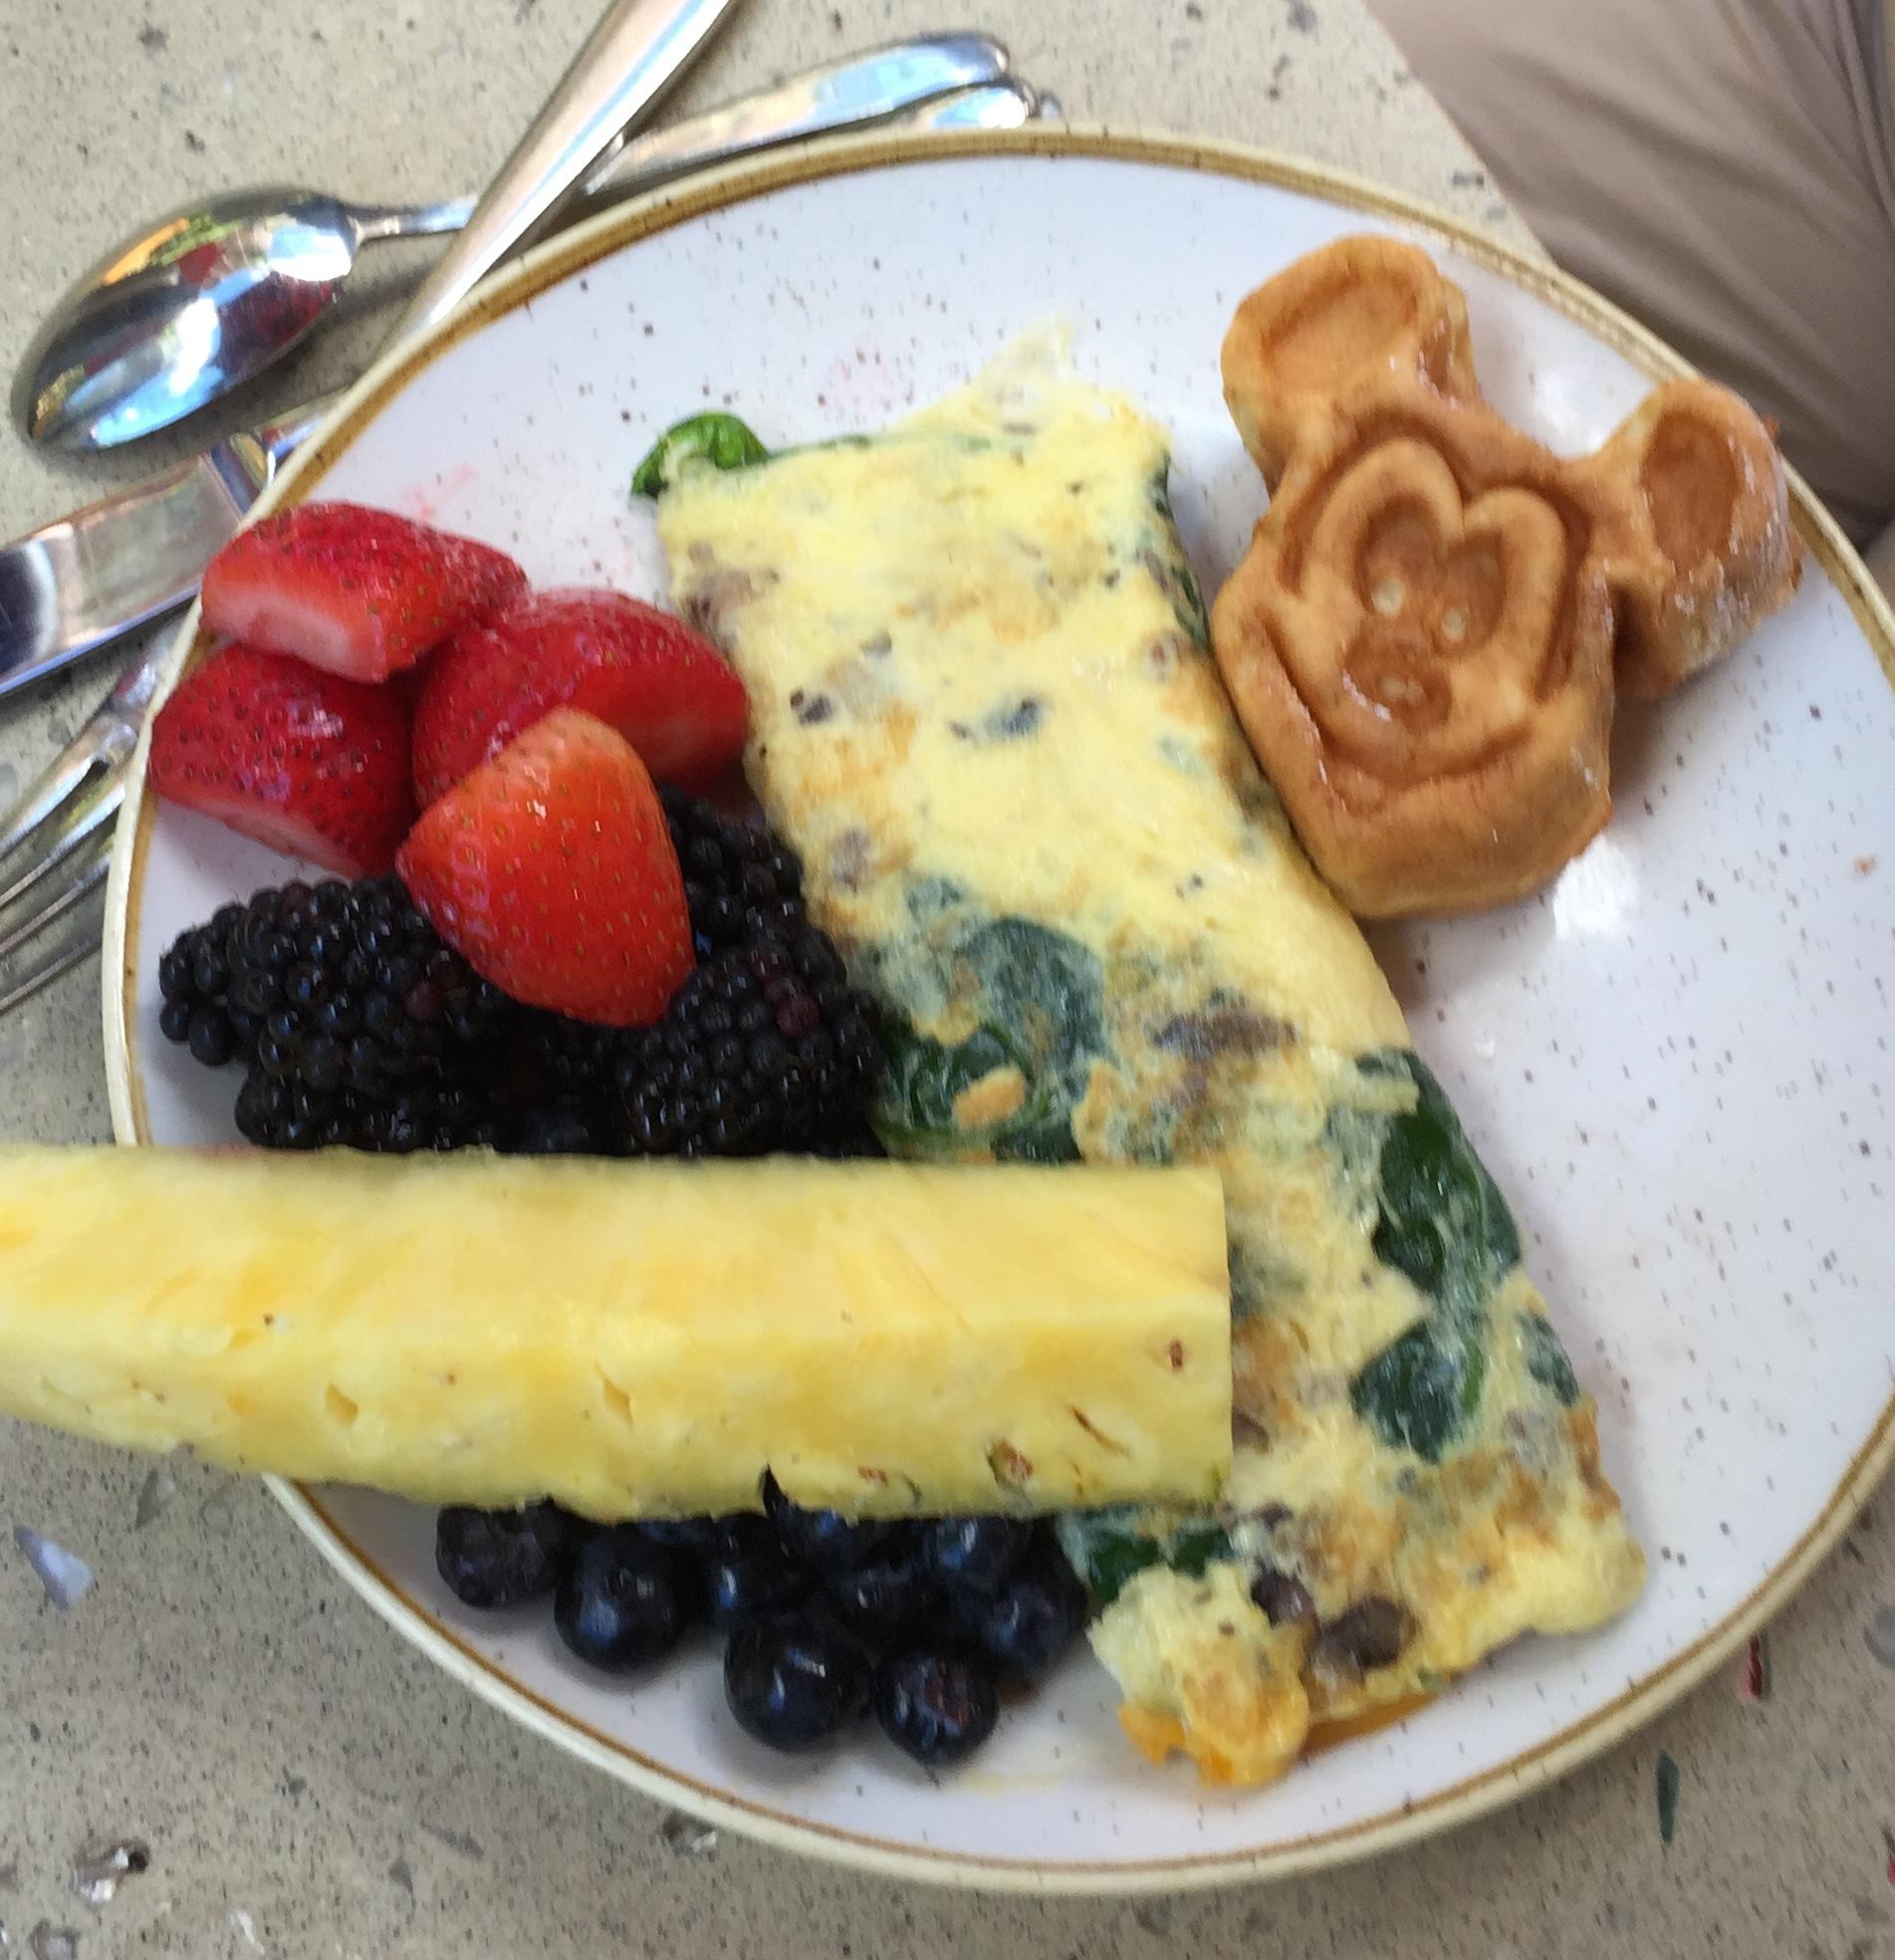 Enjoy breakfast with Mickey Mouse at Aulani - A Disney Resort and Spa in Ko Olina, Hawaii | PassPorter.com